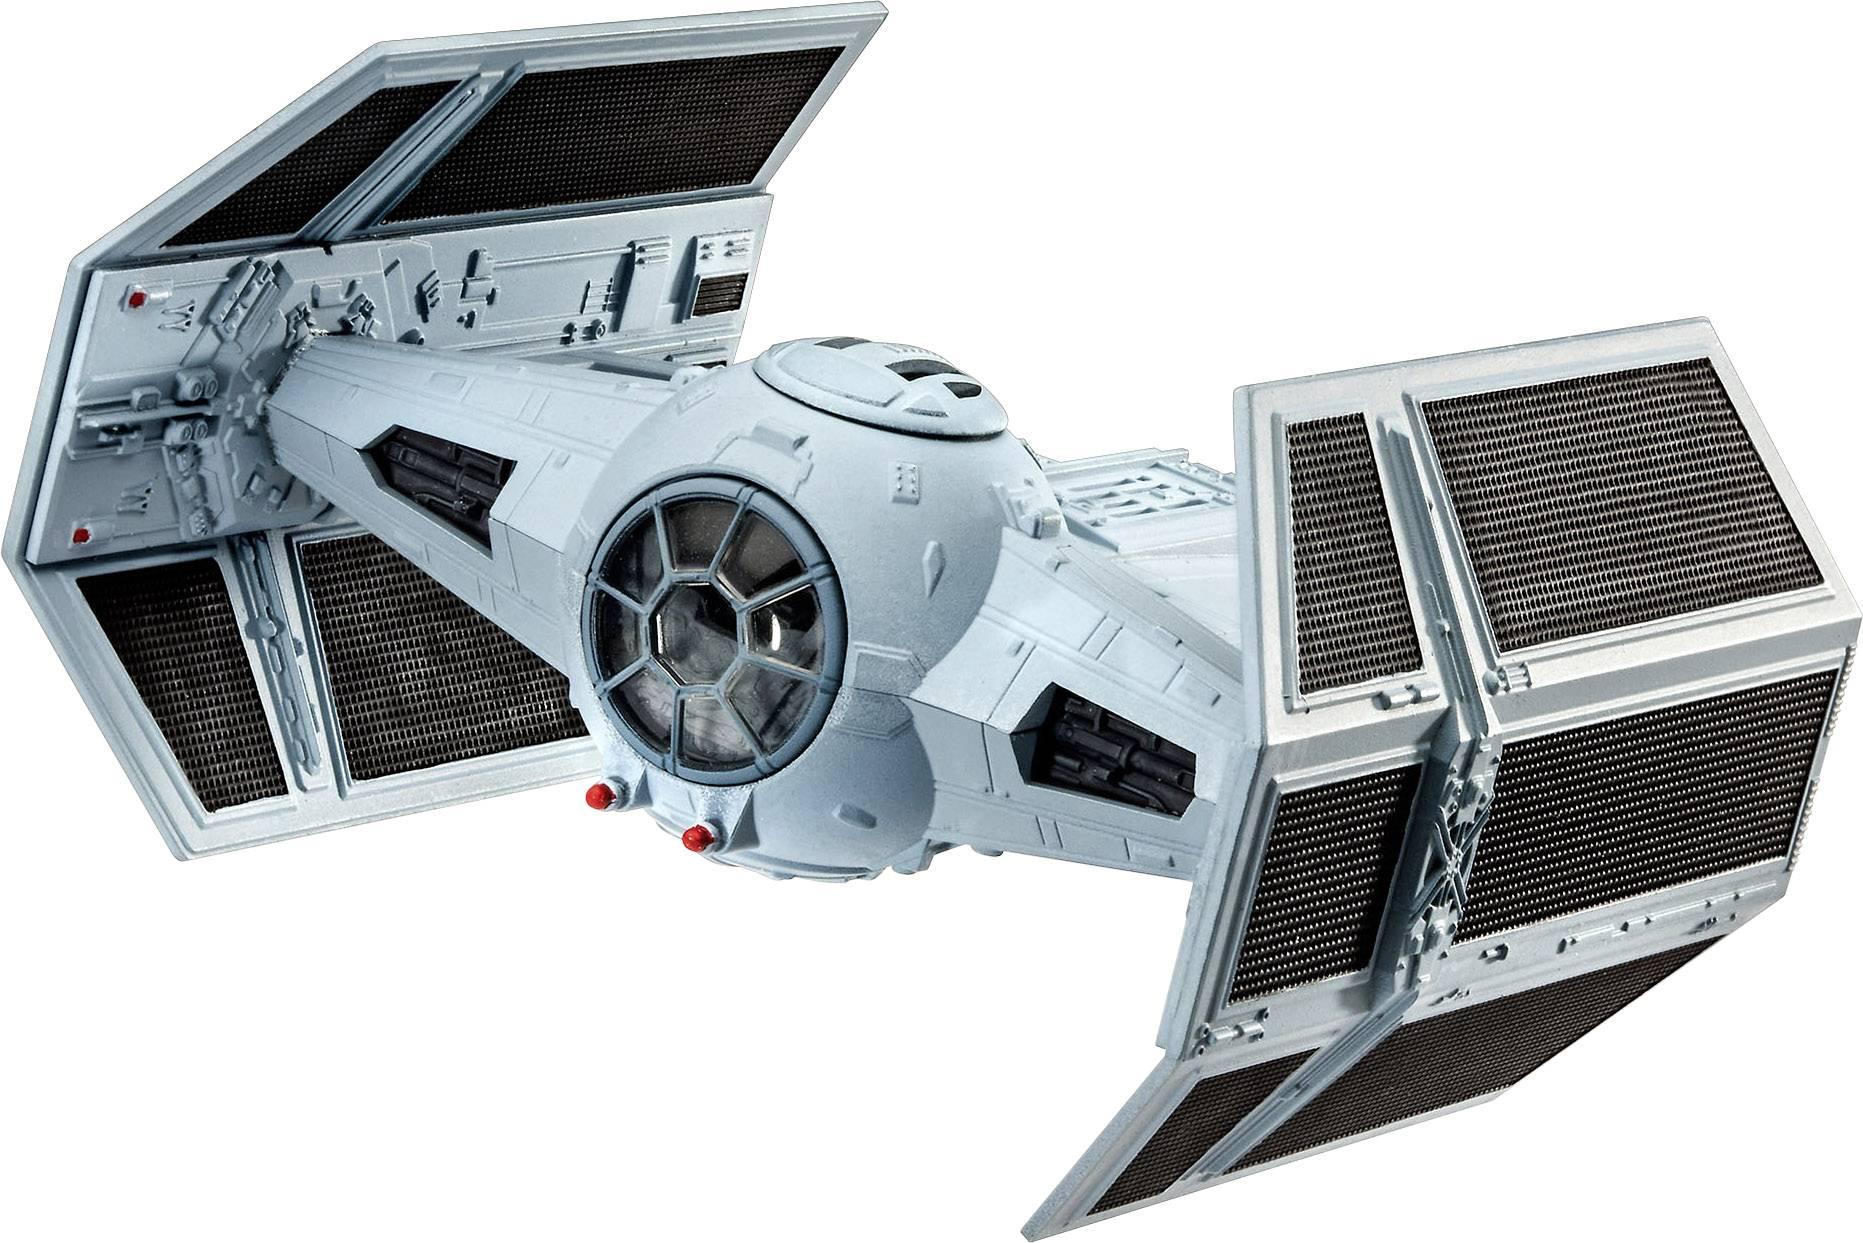 Star Wars Darth Vader´s Tie Fighter, sci-fi model, stavebnica Revell 03602